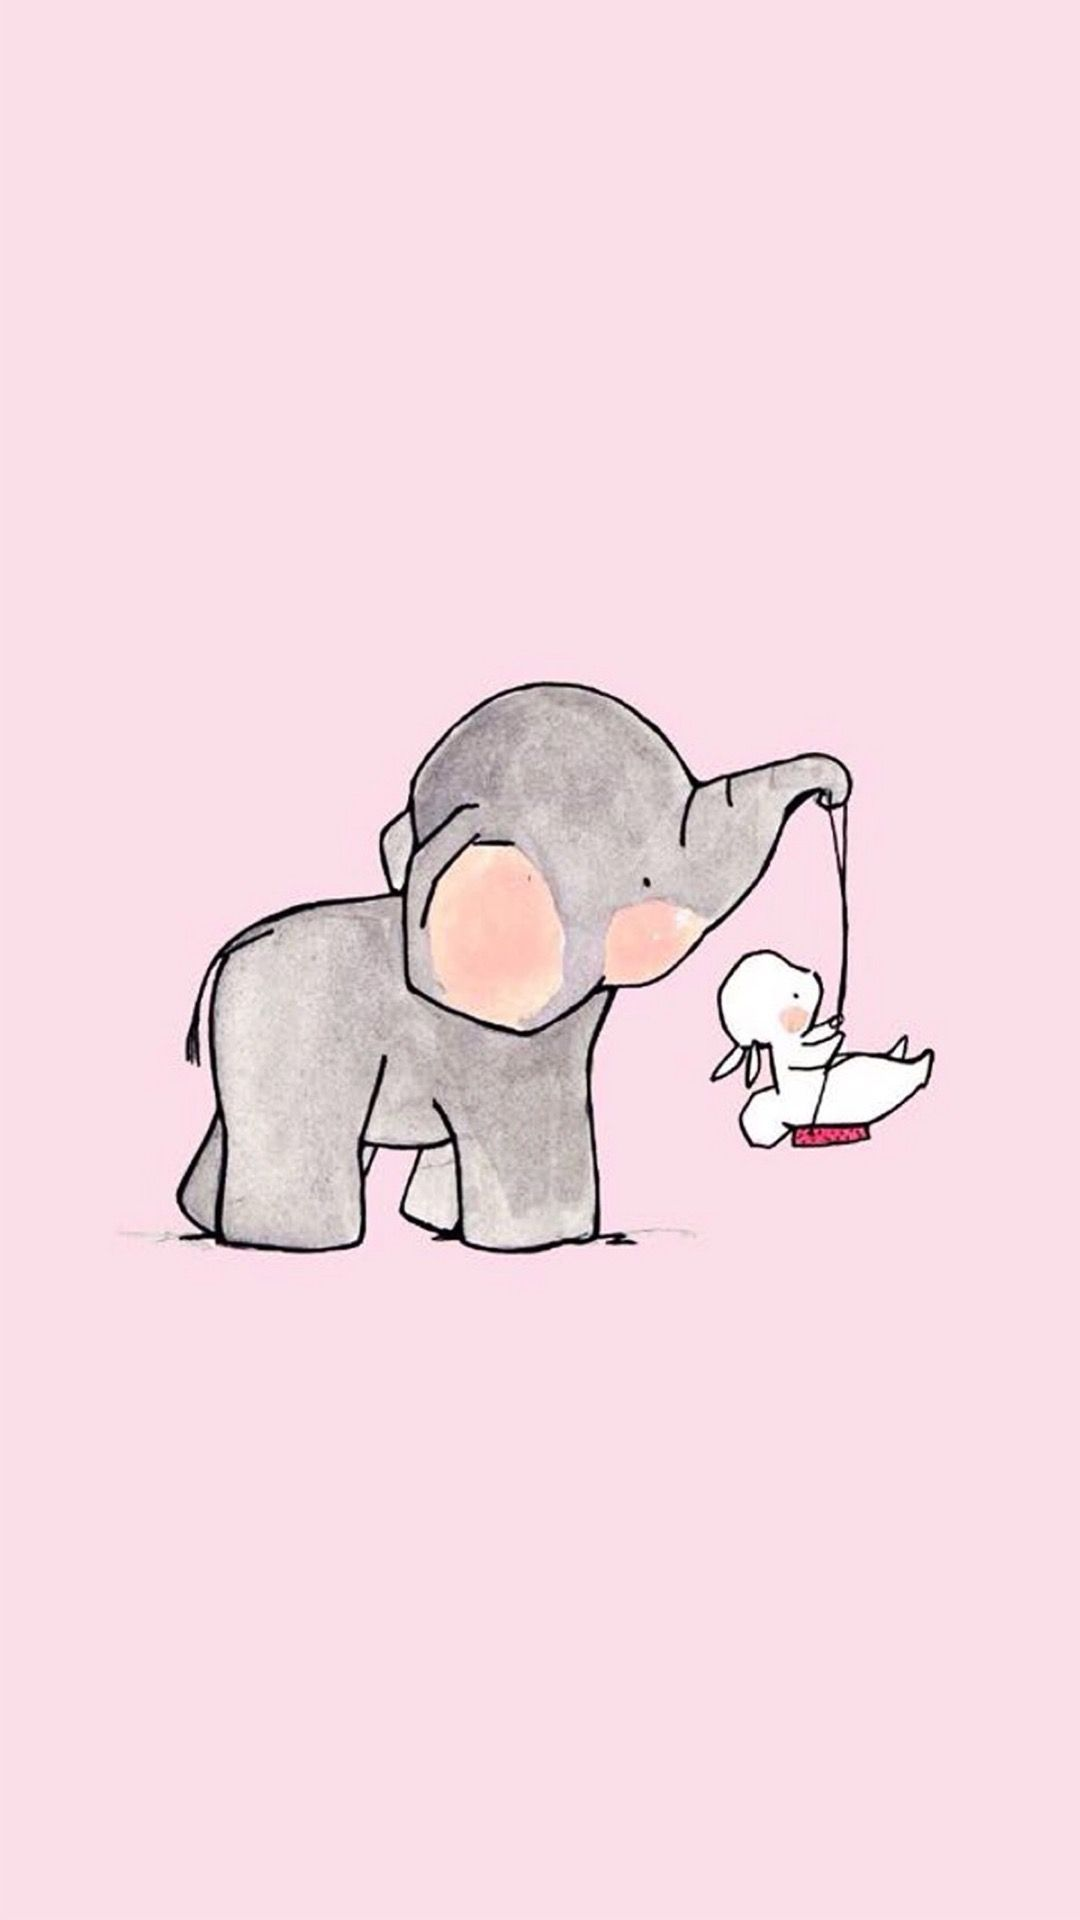 Baby Elephant Background : elephant, background, Elephant, Background, Image, Drawing,, Cartoon,, Drawing